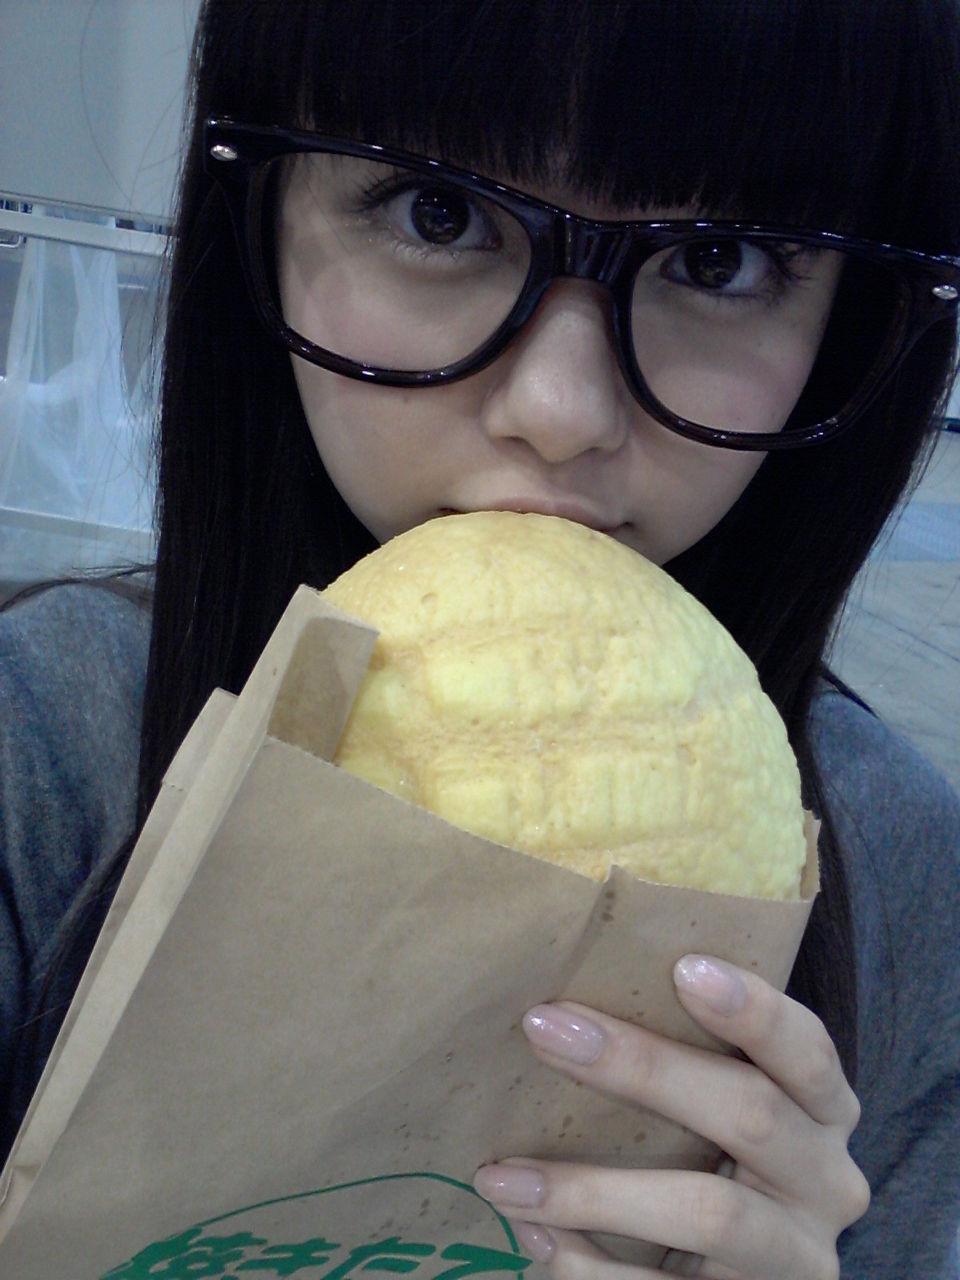 http://livedoor.blogimg.jp/omaeranews-idol/imgs/c/e/ce1c43c2.jpg